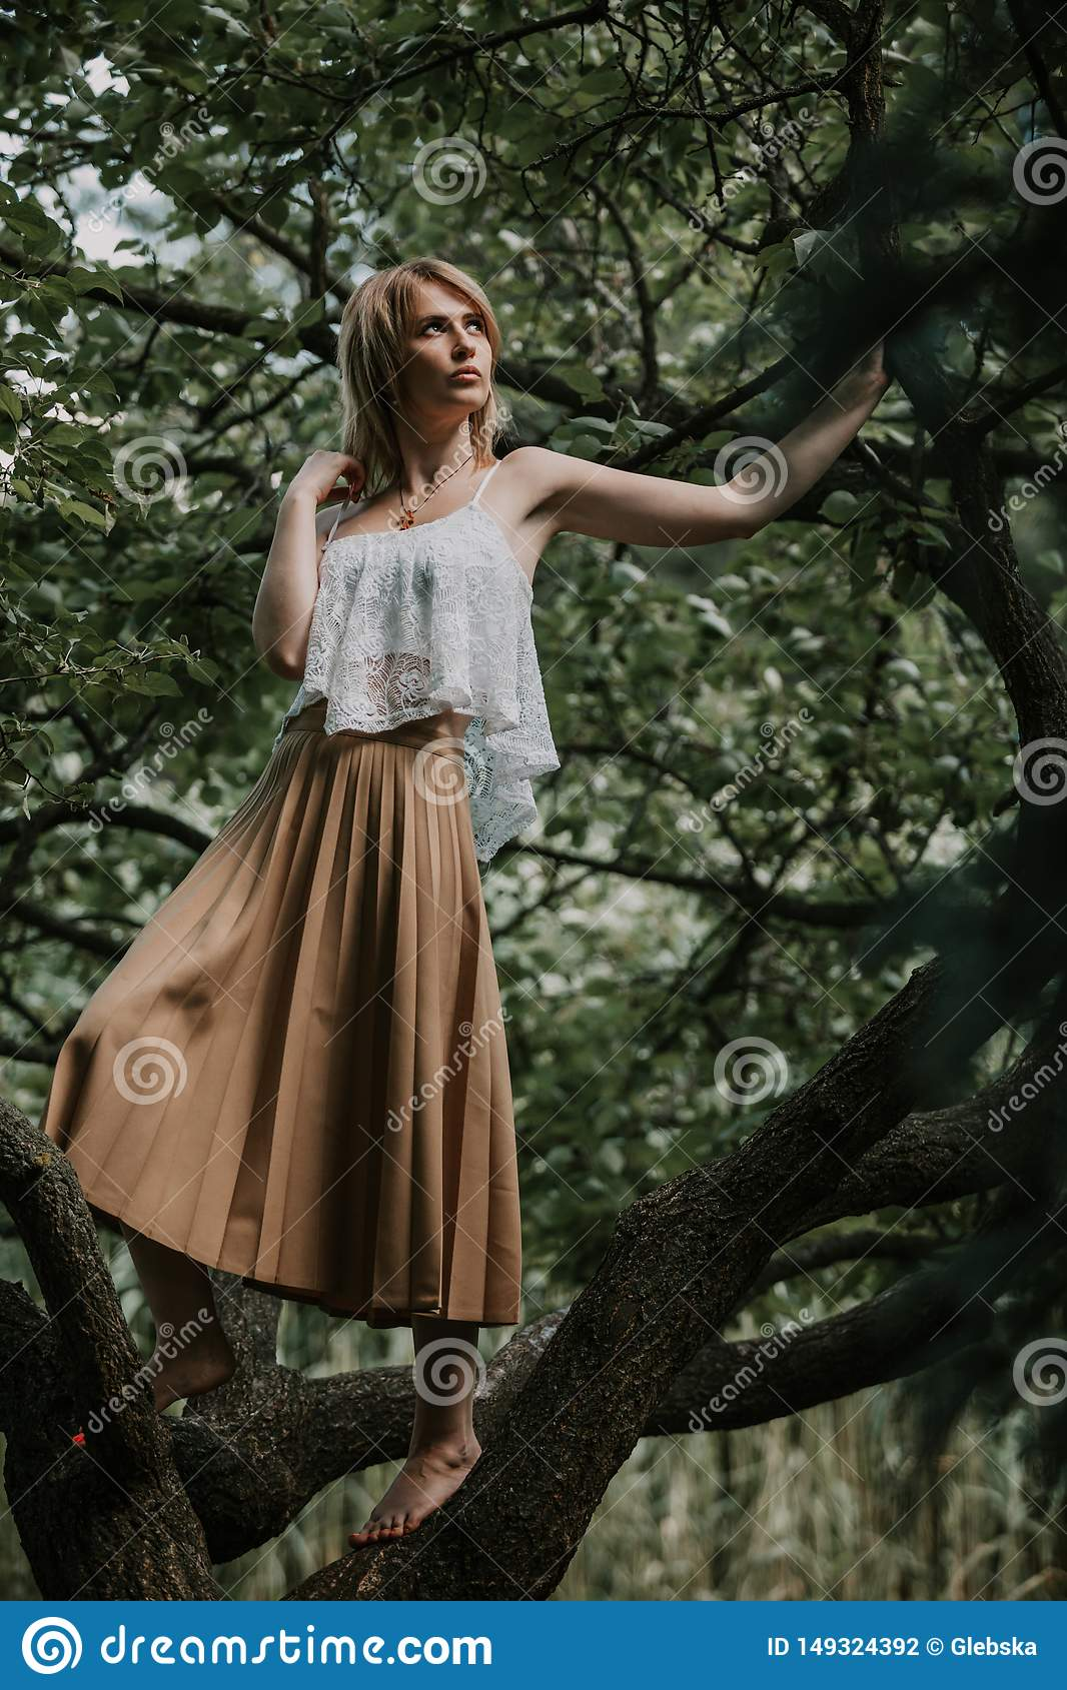 https://thumbs.dreamstime.com/z/pretty-blonde-stands-barefoot-tree-branch-portrait-nature-slender-girl-white-top-skirt-standing-summer-day-149324392.jpg